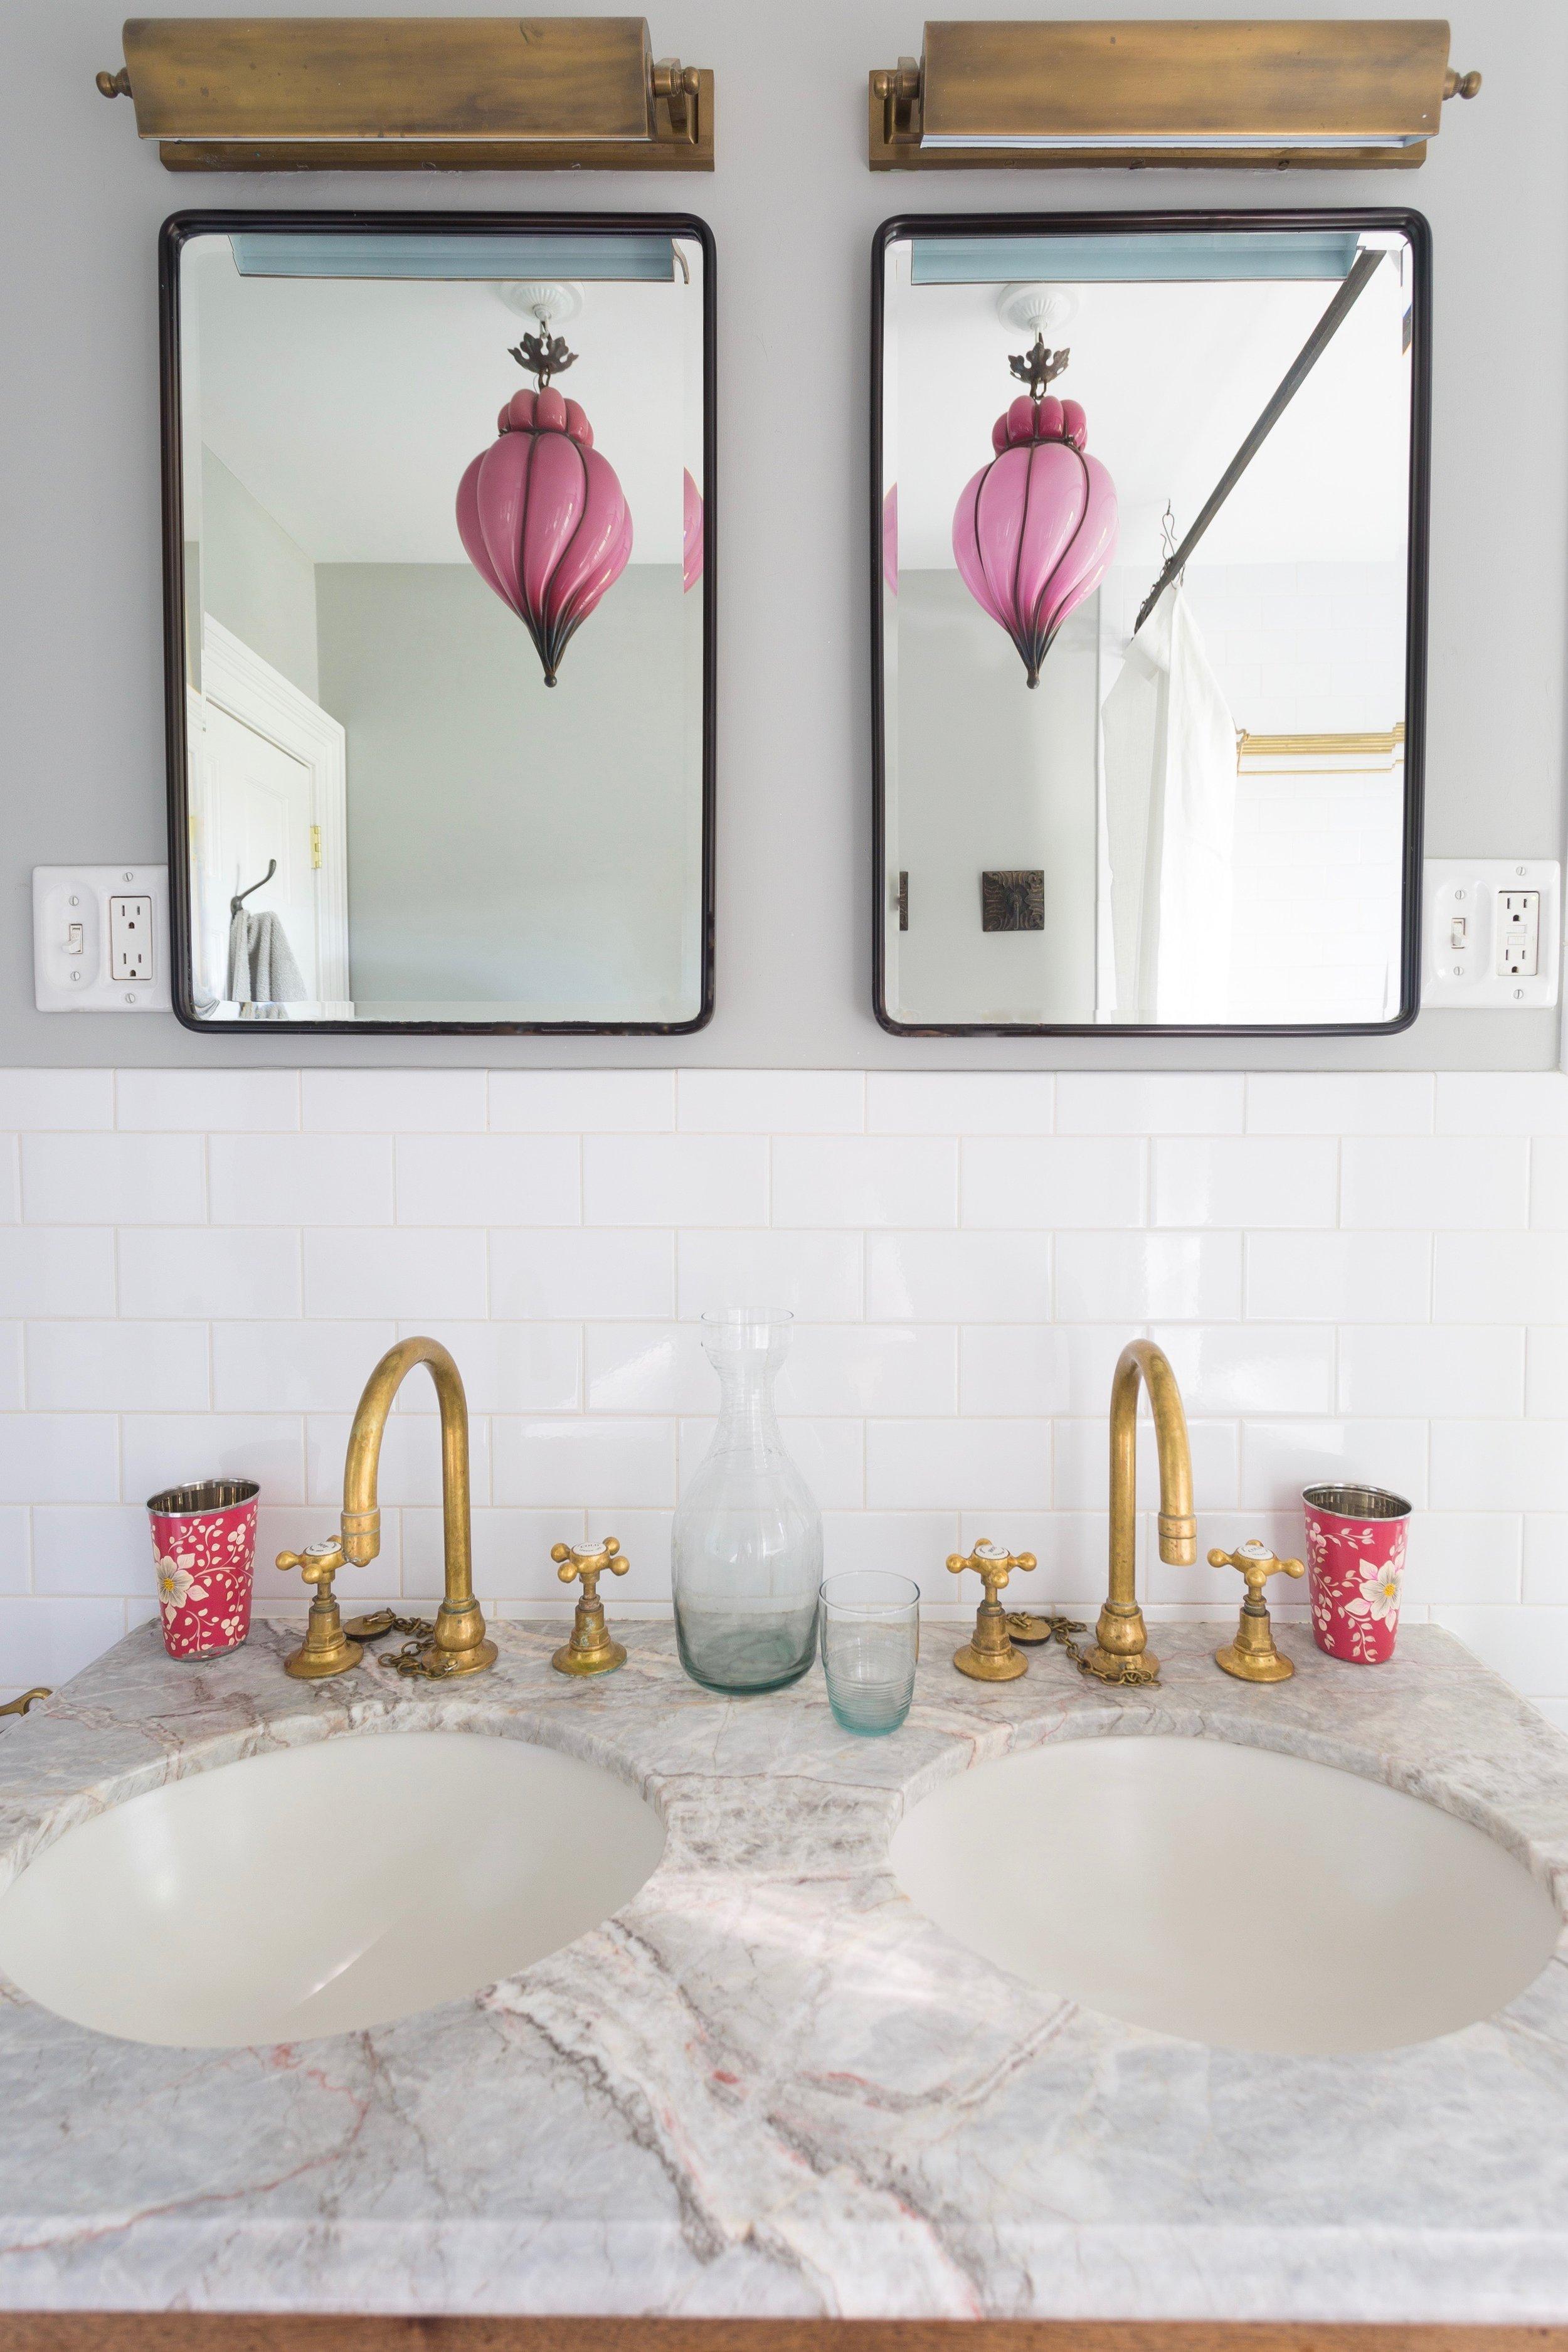 Indigo & Ochre Design Prospect Heights Bathroom Vanity Mouthblown Light Reflection